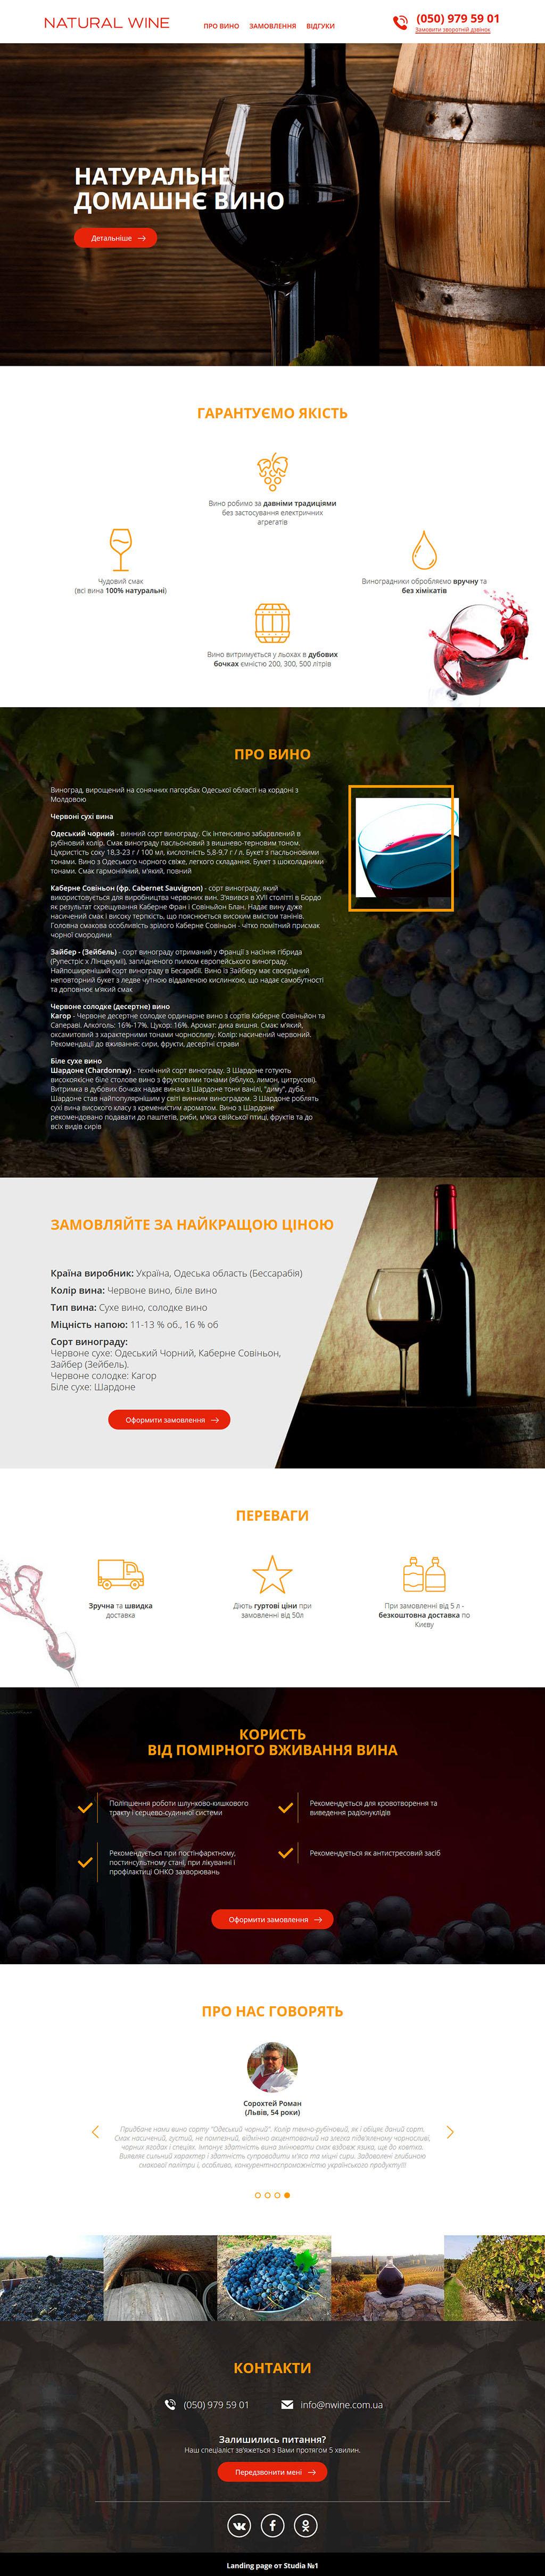 Landing Page — Домашнее Вино